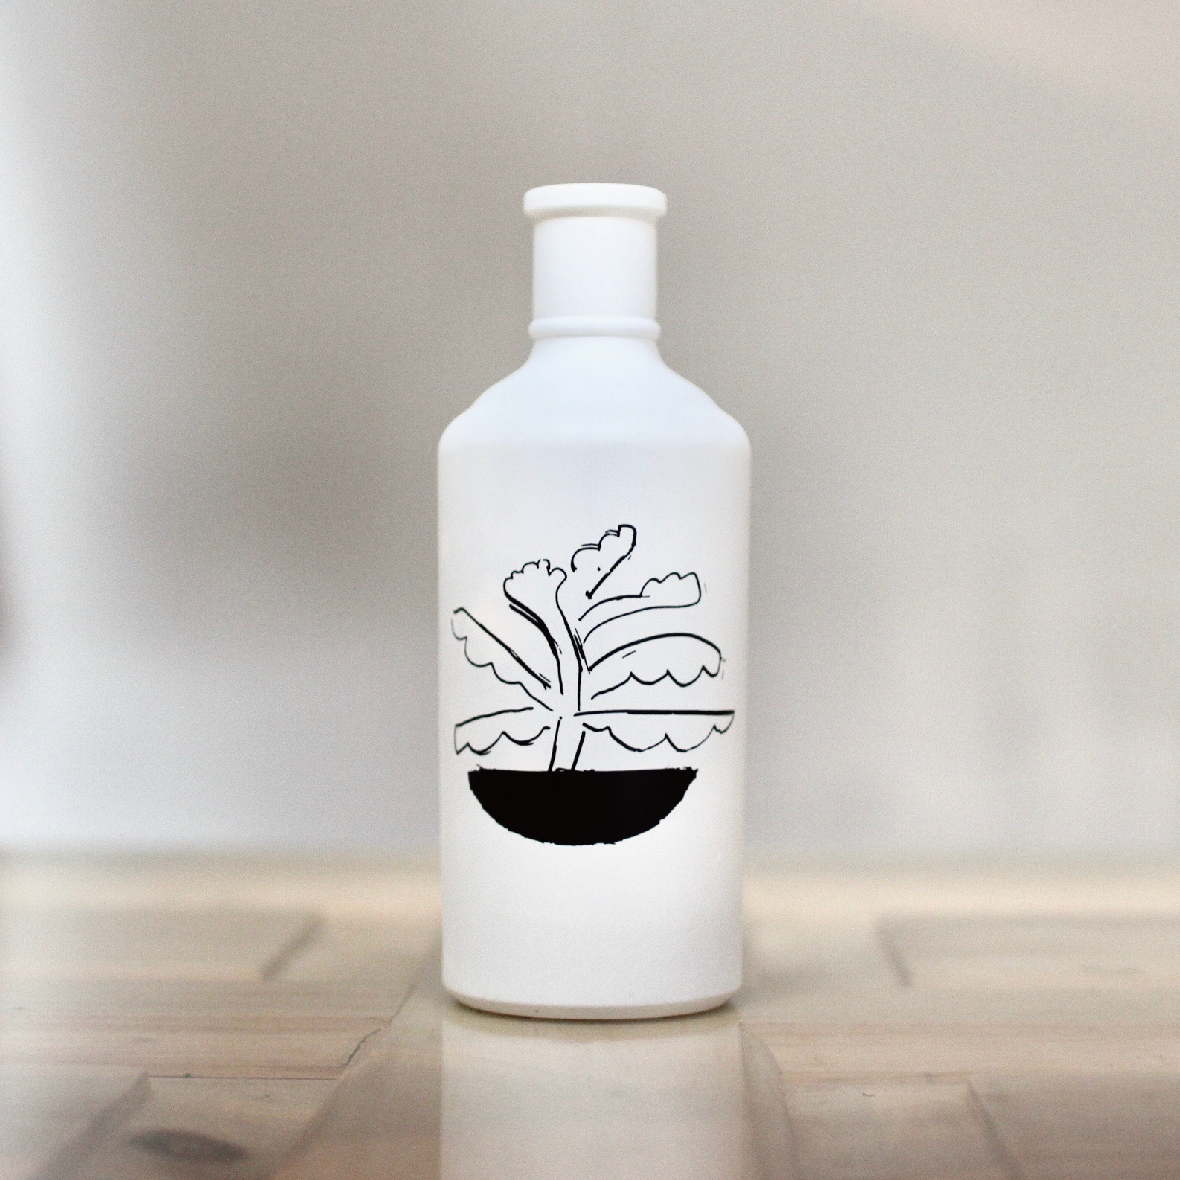 雑花瓶 VASE07